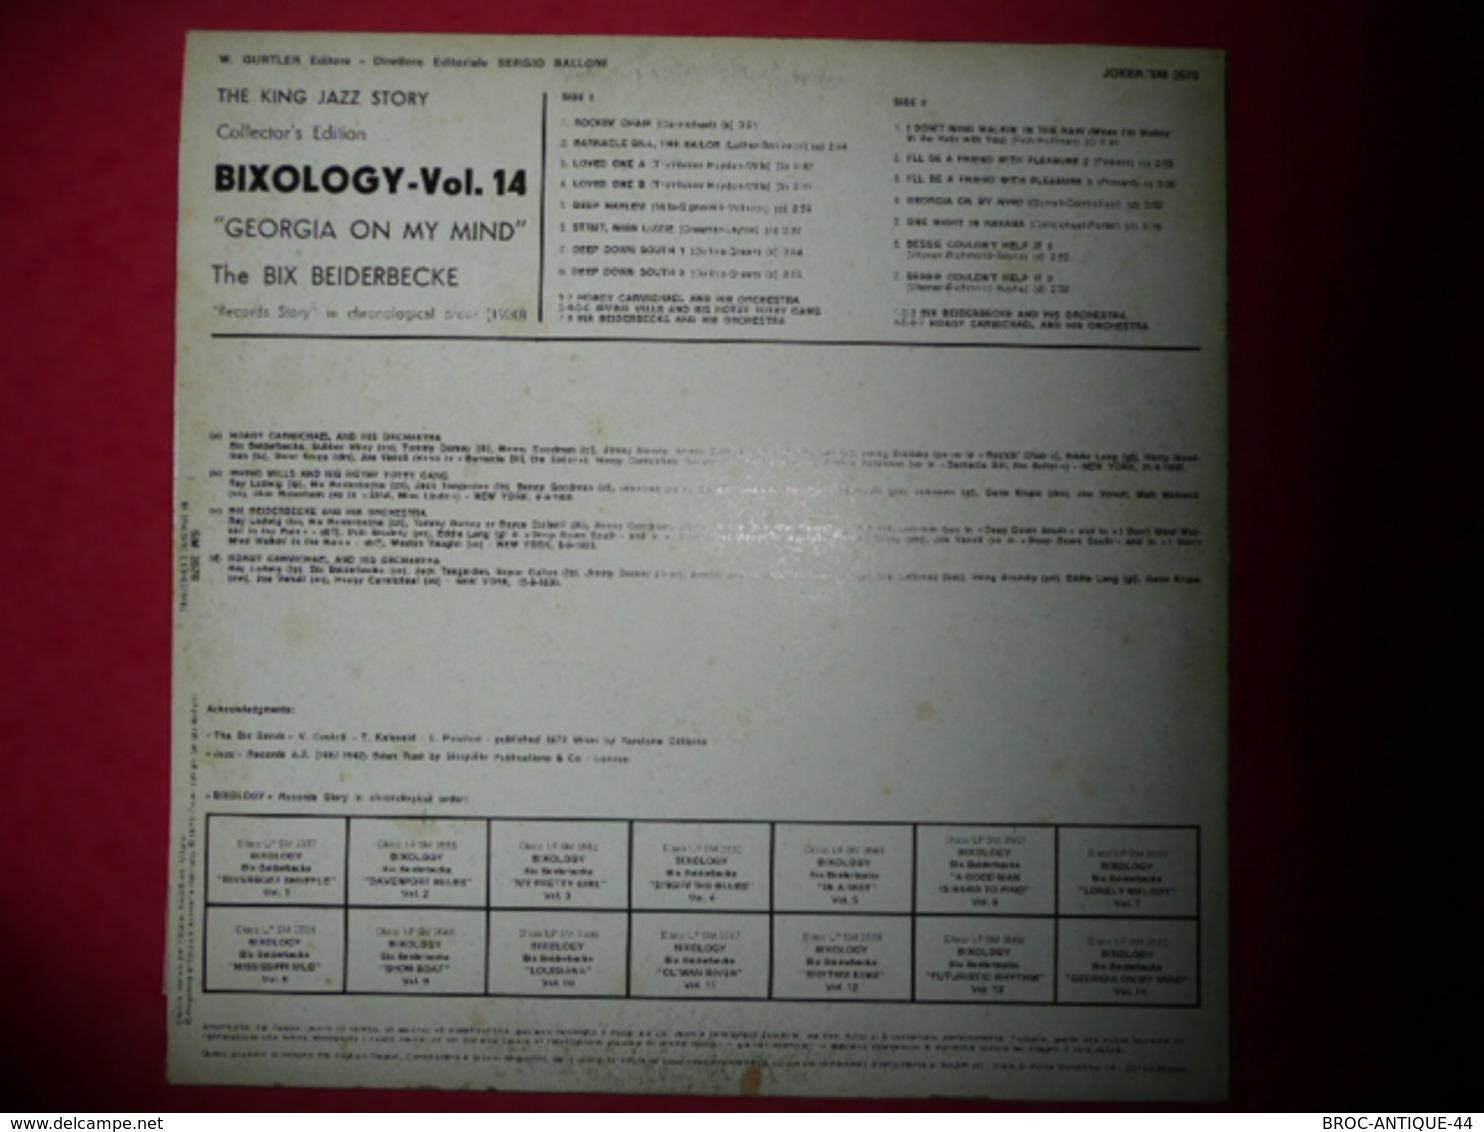 LP33 N°712 - THE BIX BEIDERBECKE - BIXOLOGY - COMPILATION 15 TITRES - Jazz